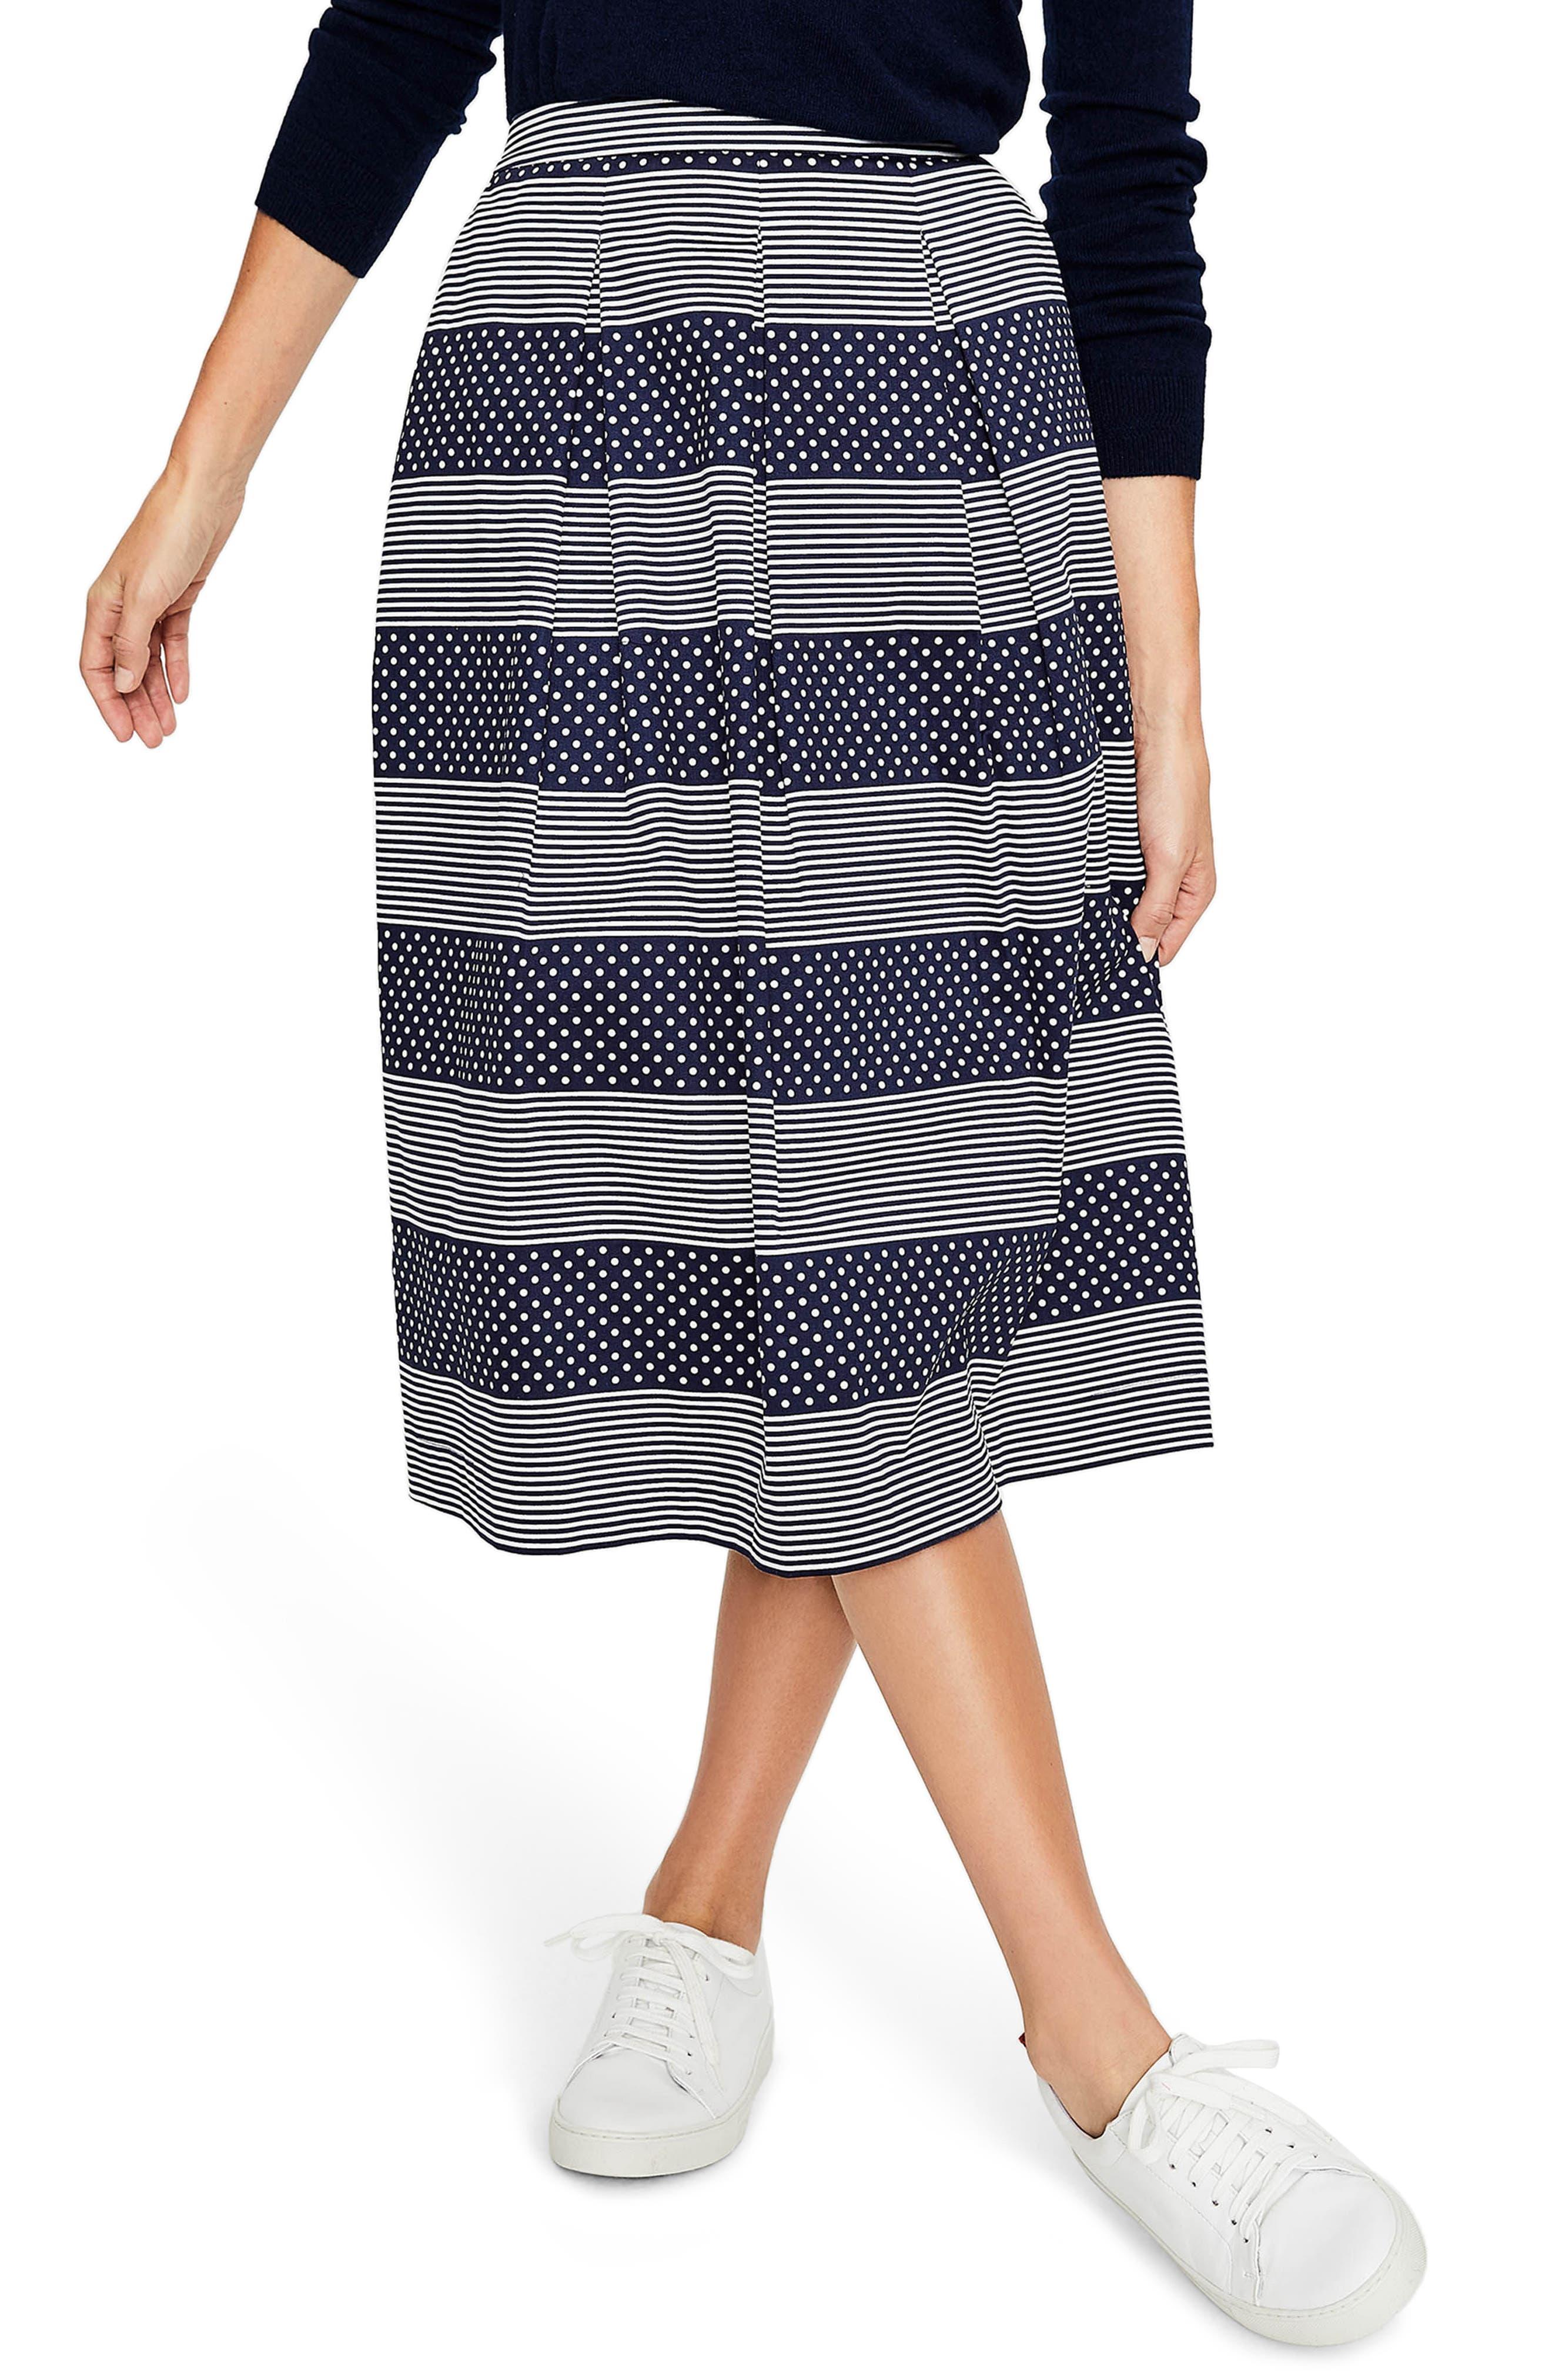 Lola Floral Flared Skirt,                         Main,                         color, Navy/ Spot Stripe